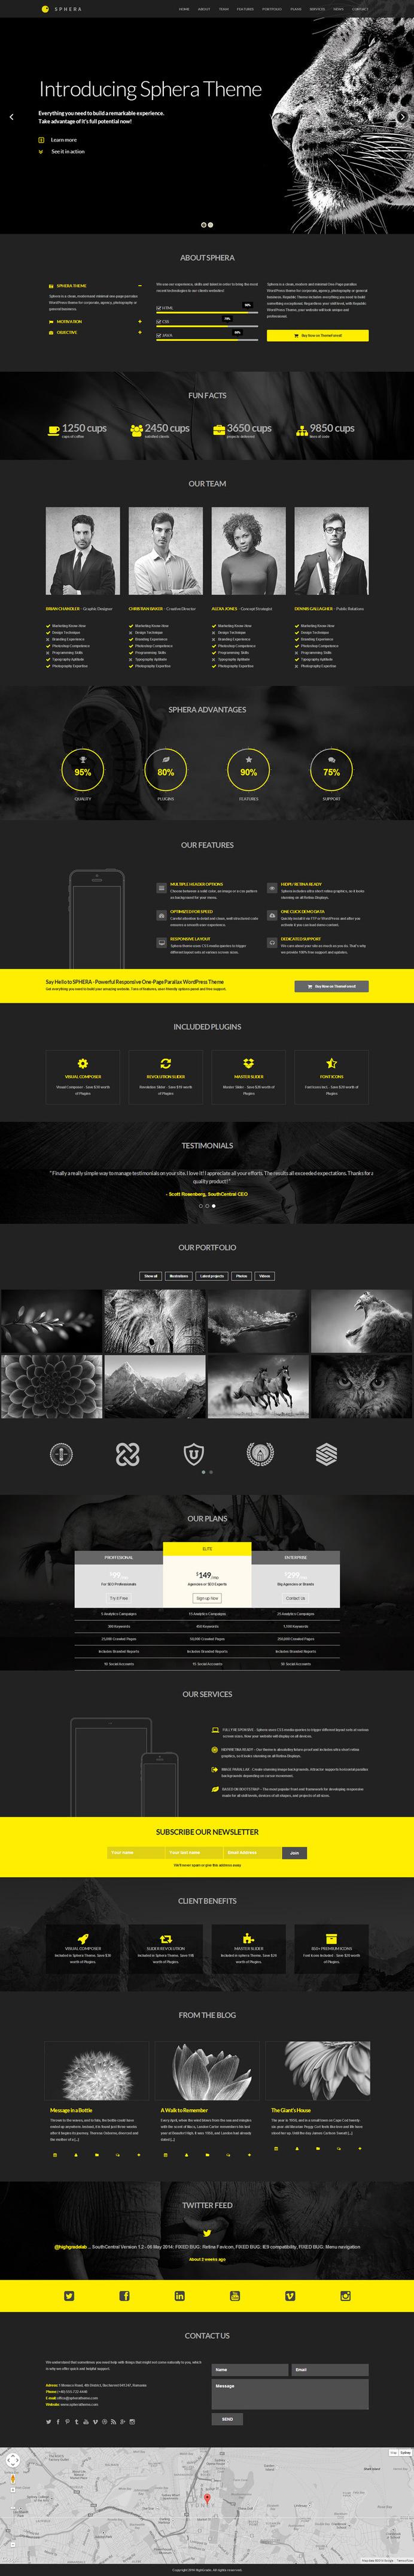 black, yellow, concept, web design, layout, modern, minimalist #minimalist #modern #yellow #design #black #concept #layout #web